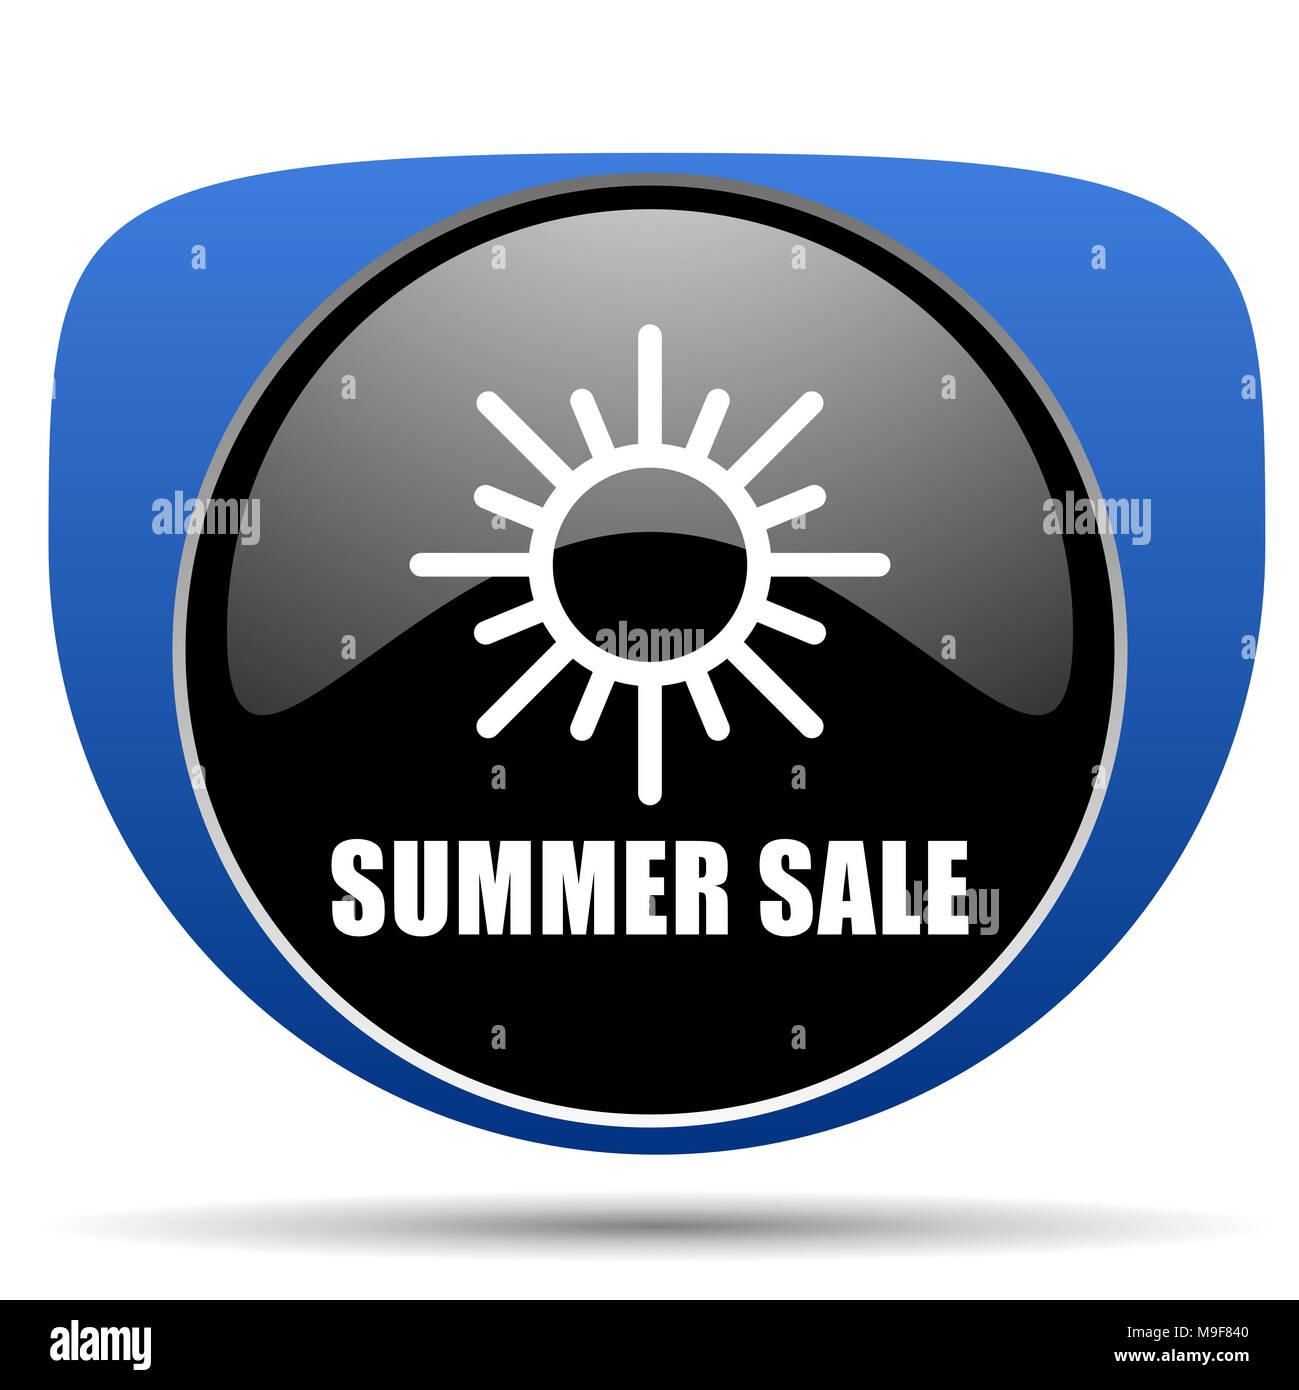 Summer sale web icon - Stock Image